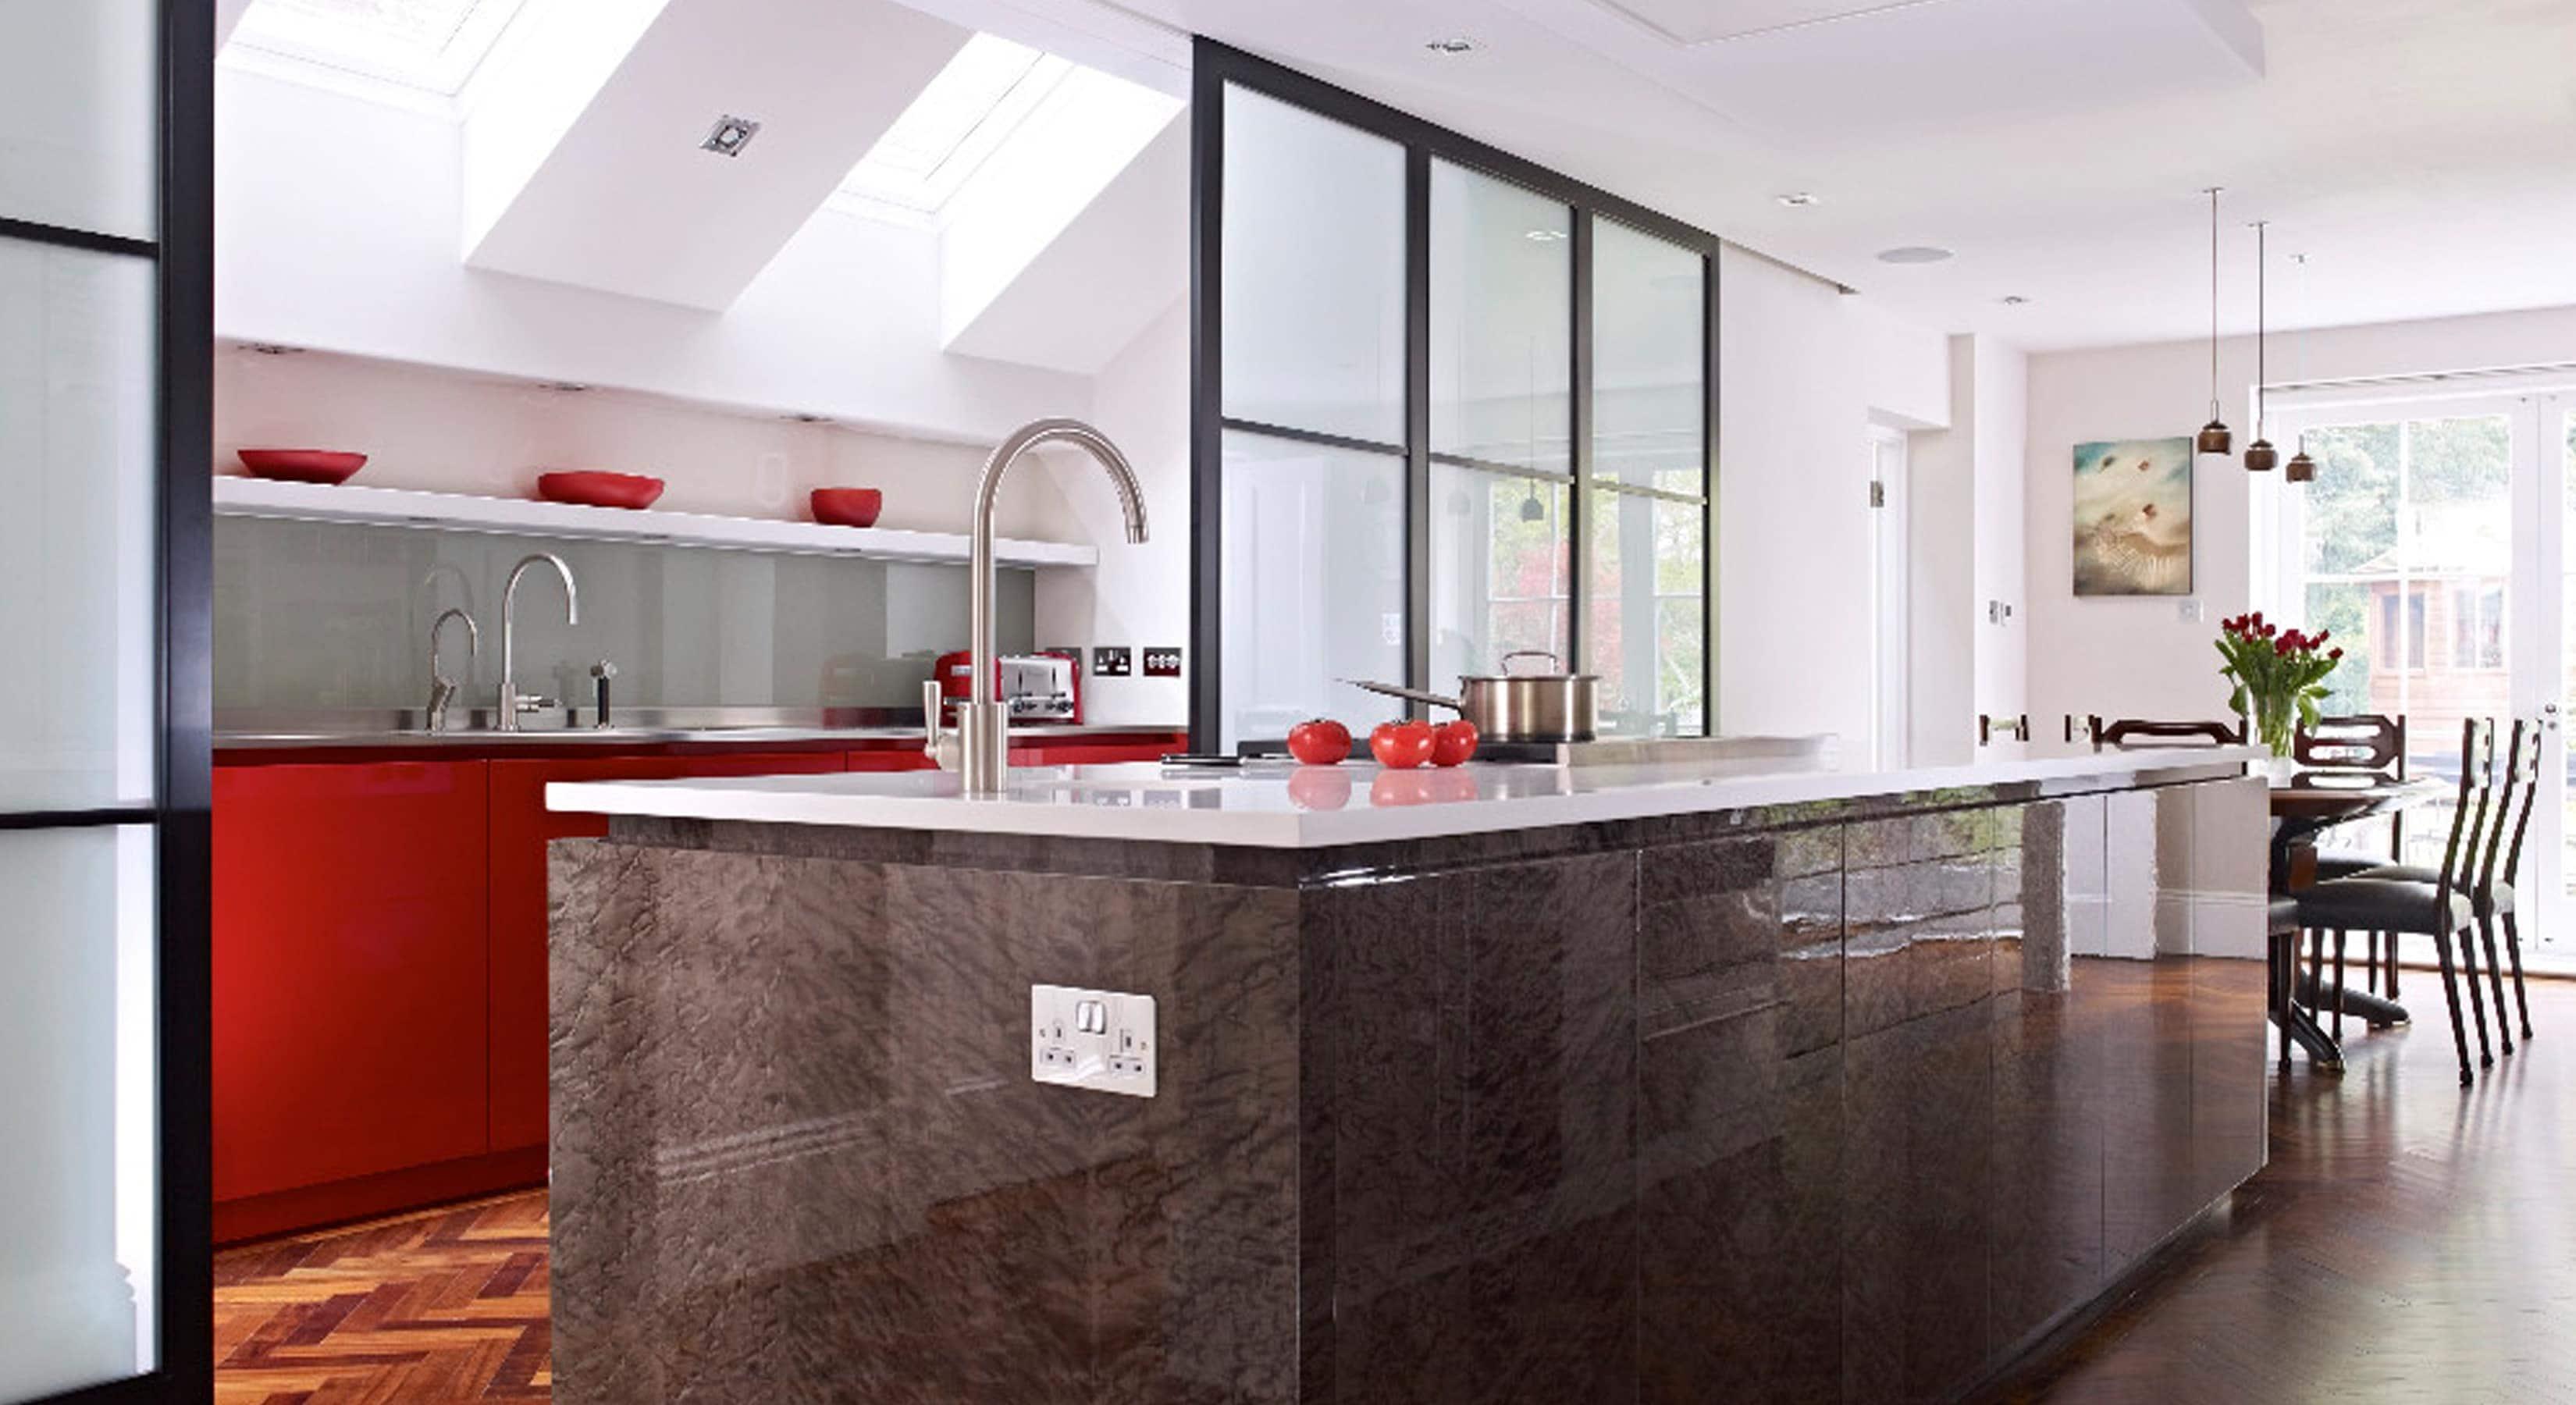 Matt kitchen extension concept